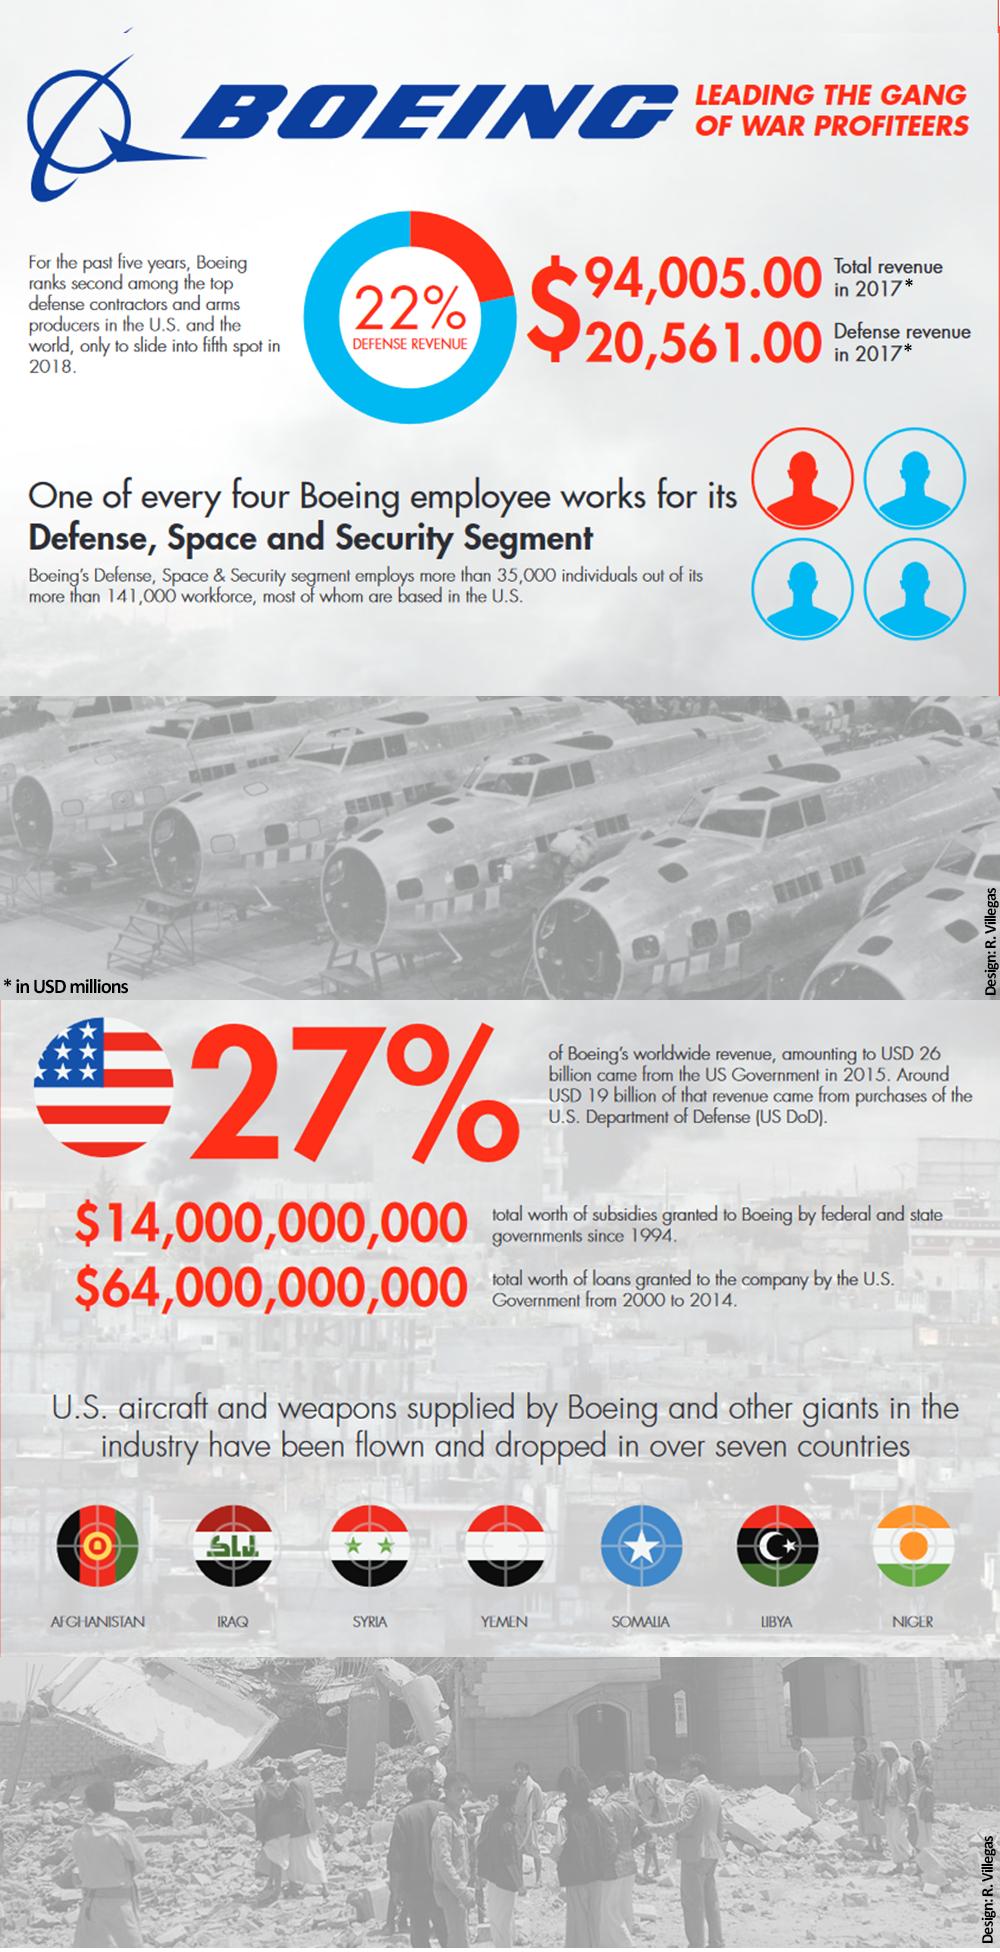 Boeing: Leading the gang of war profiteers